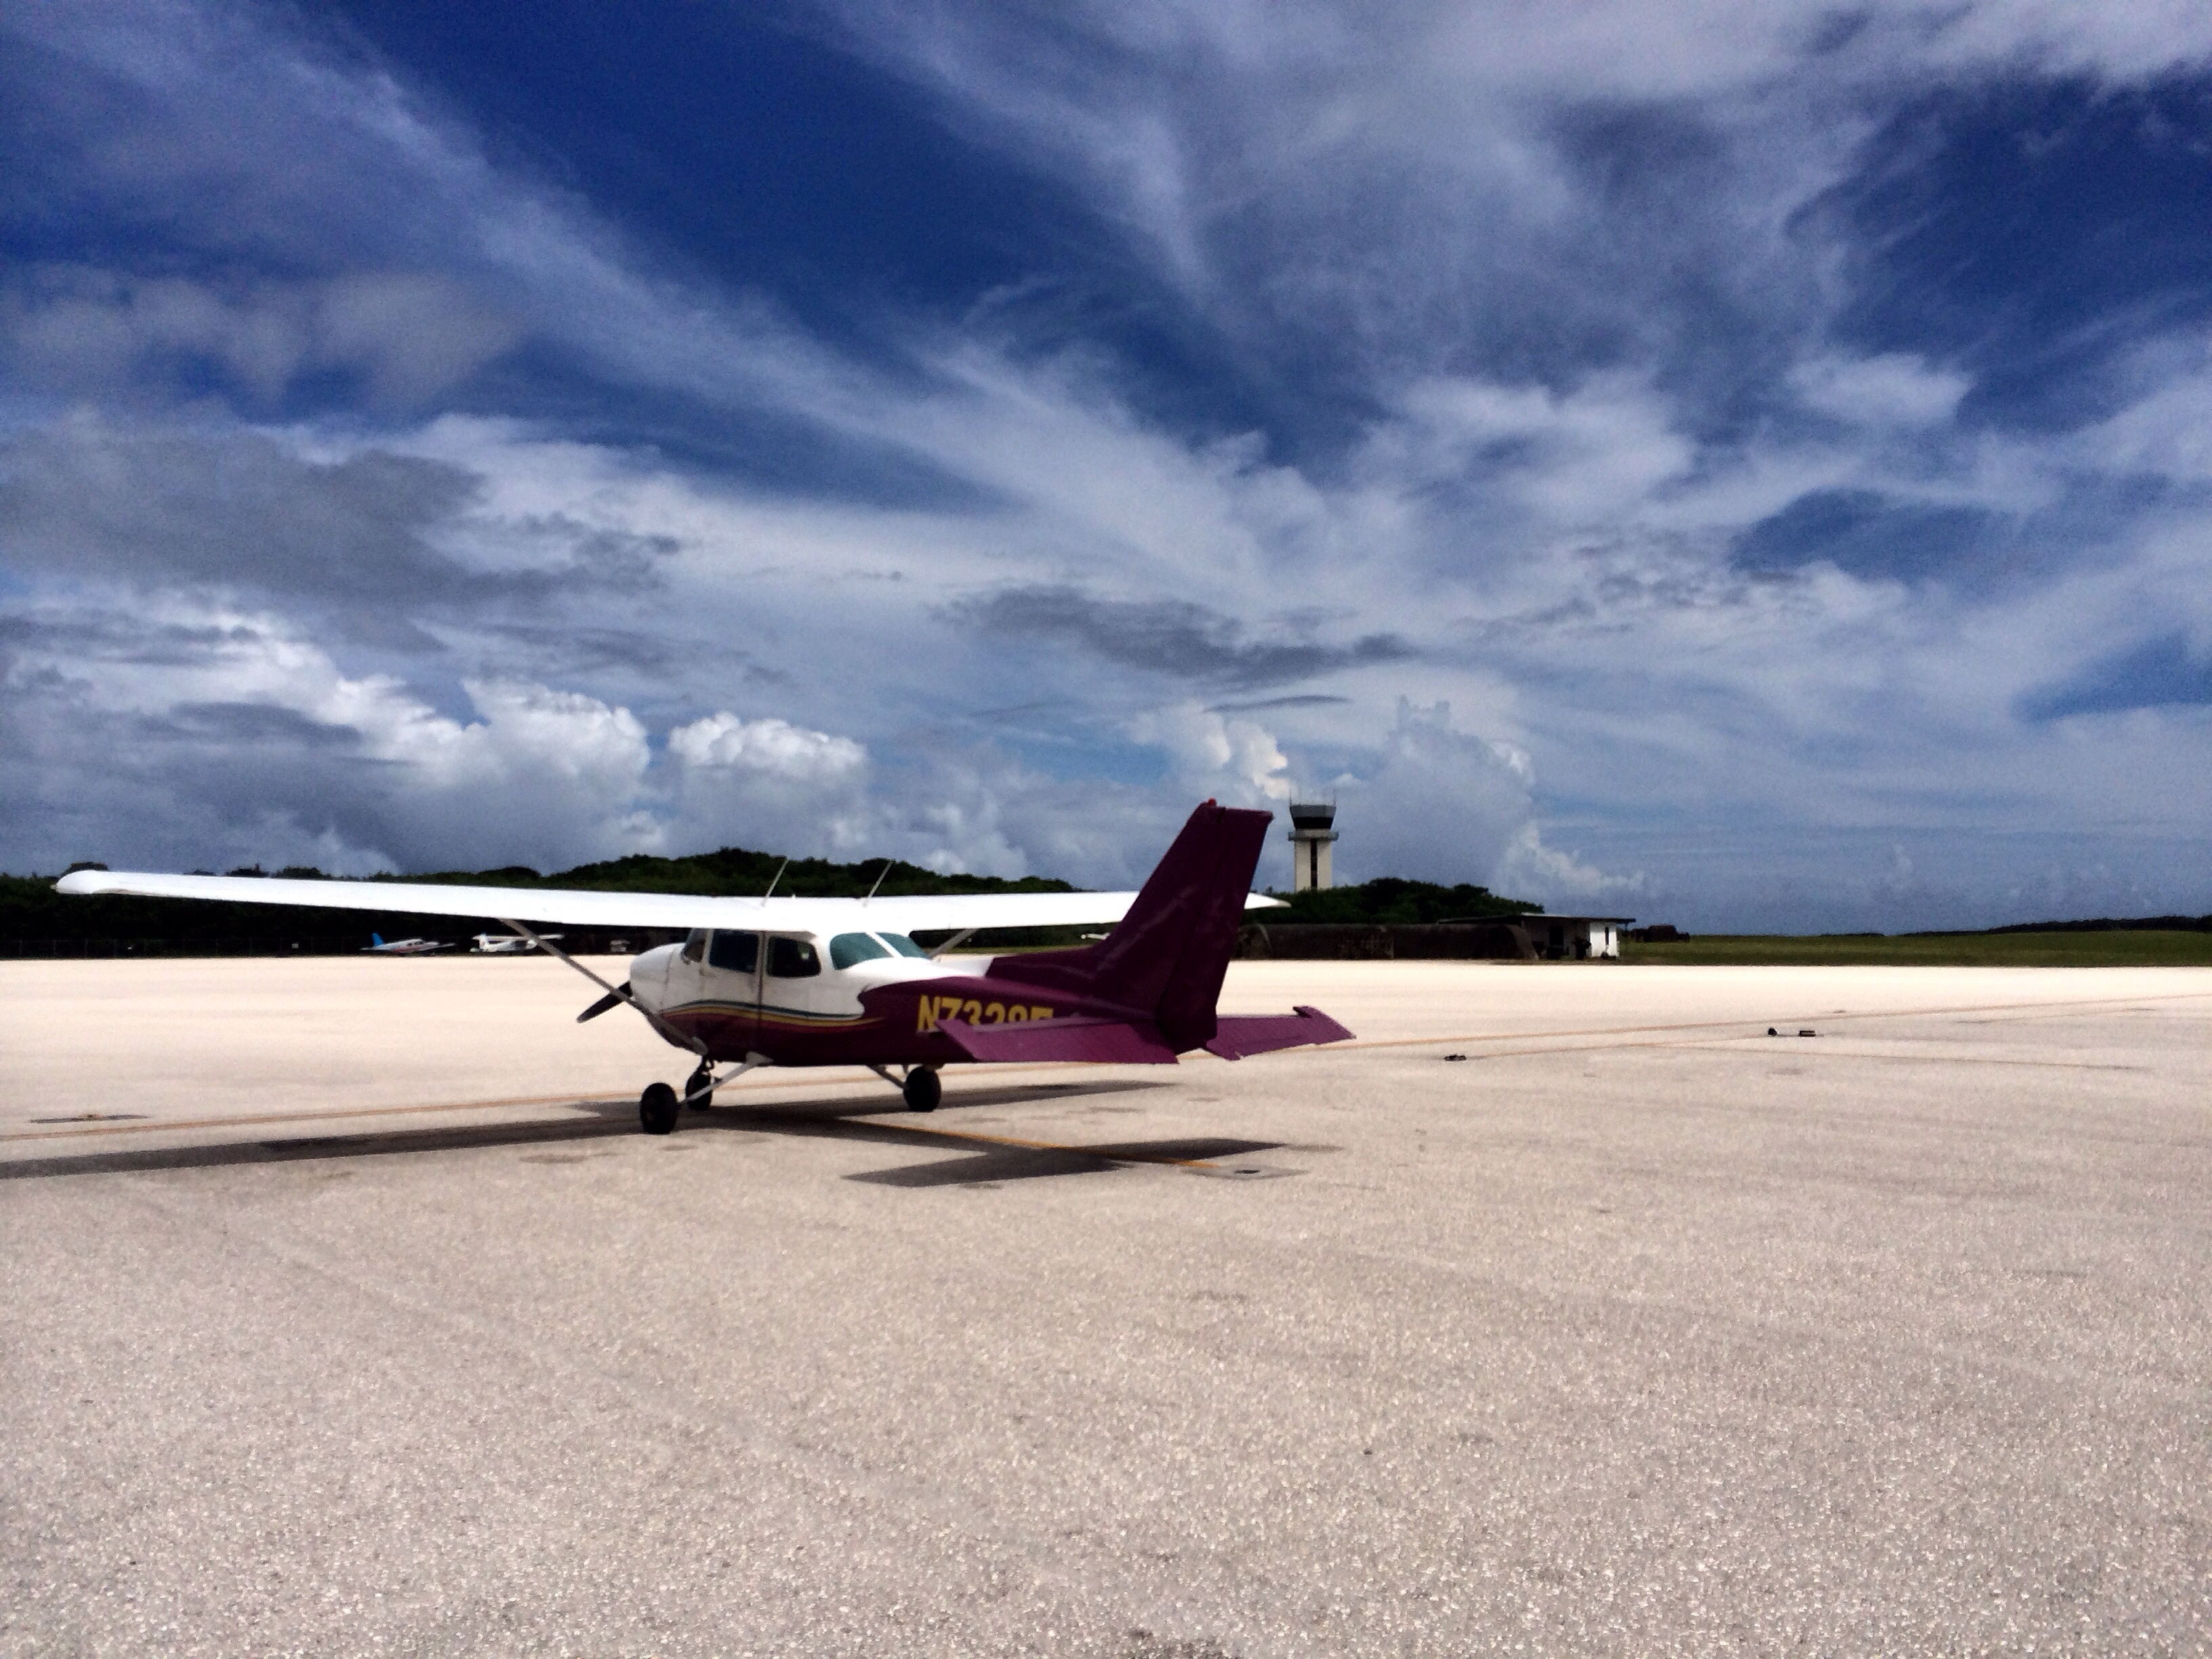 塞班岛飞机场